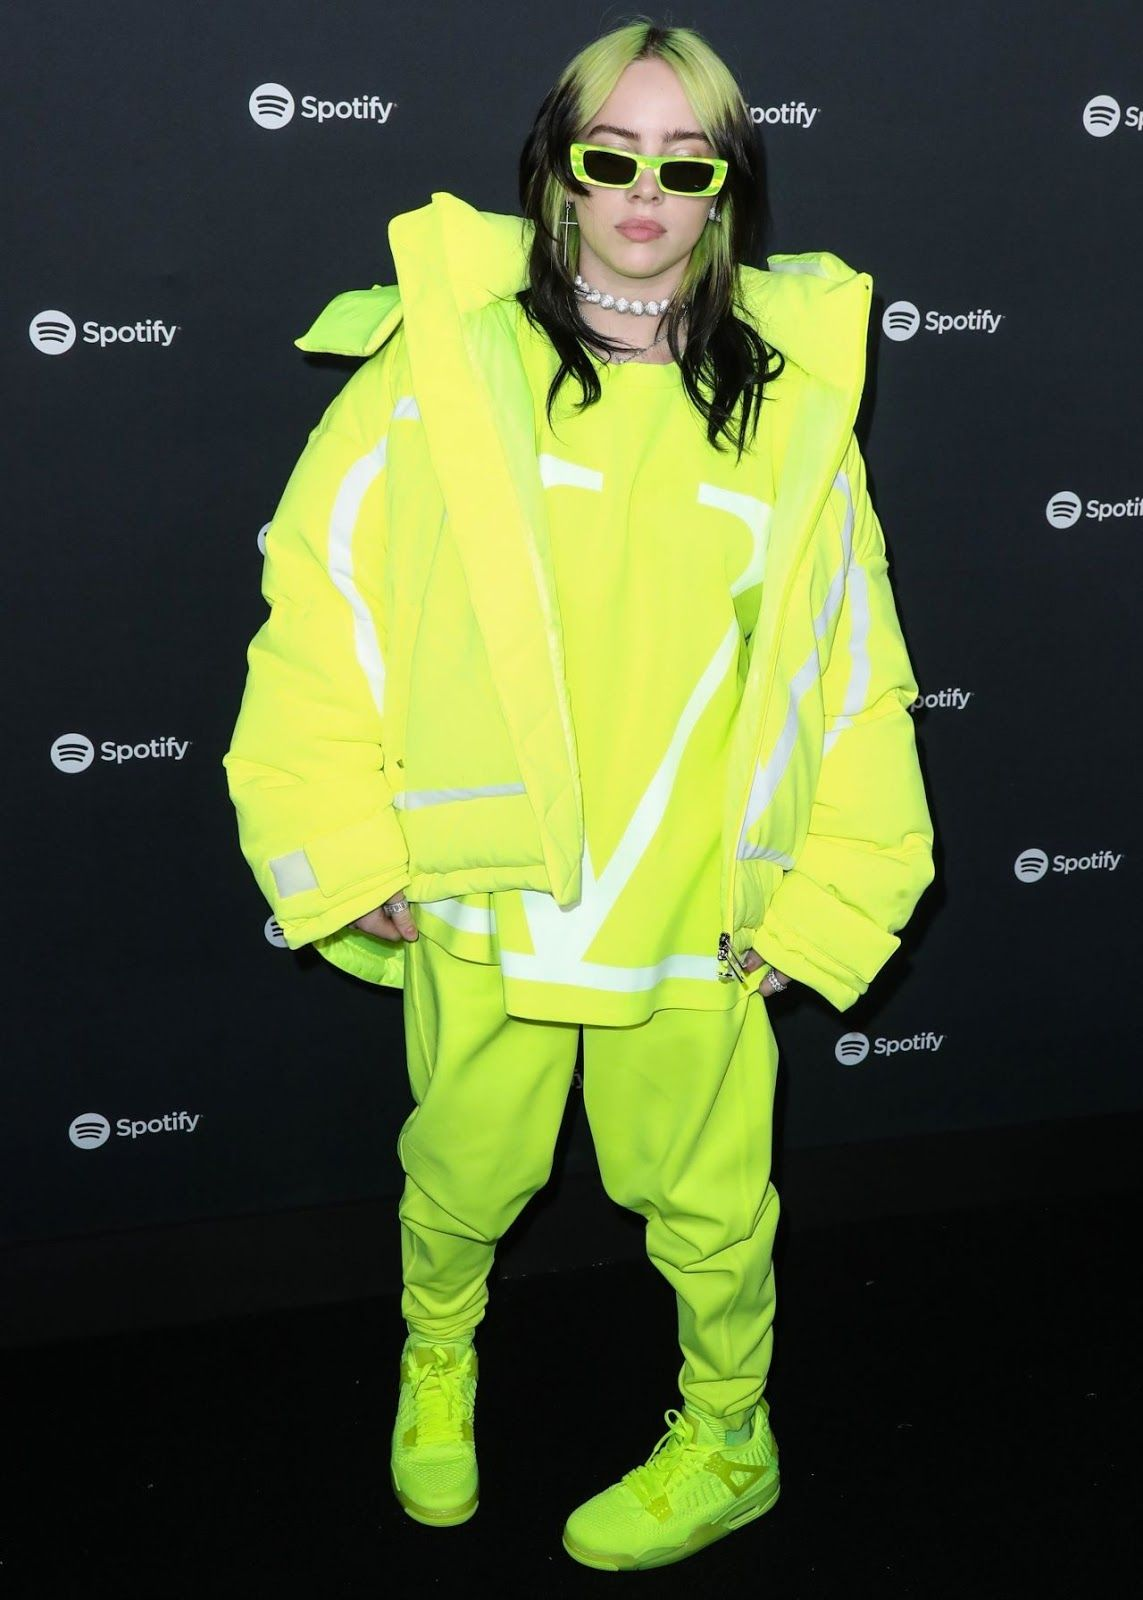 Billie eilish spotify best new artist 2020 party in la